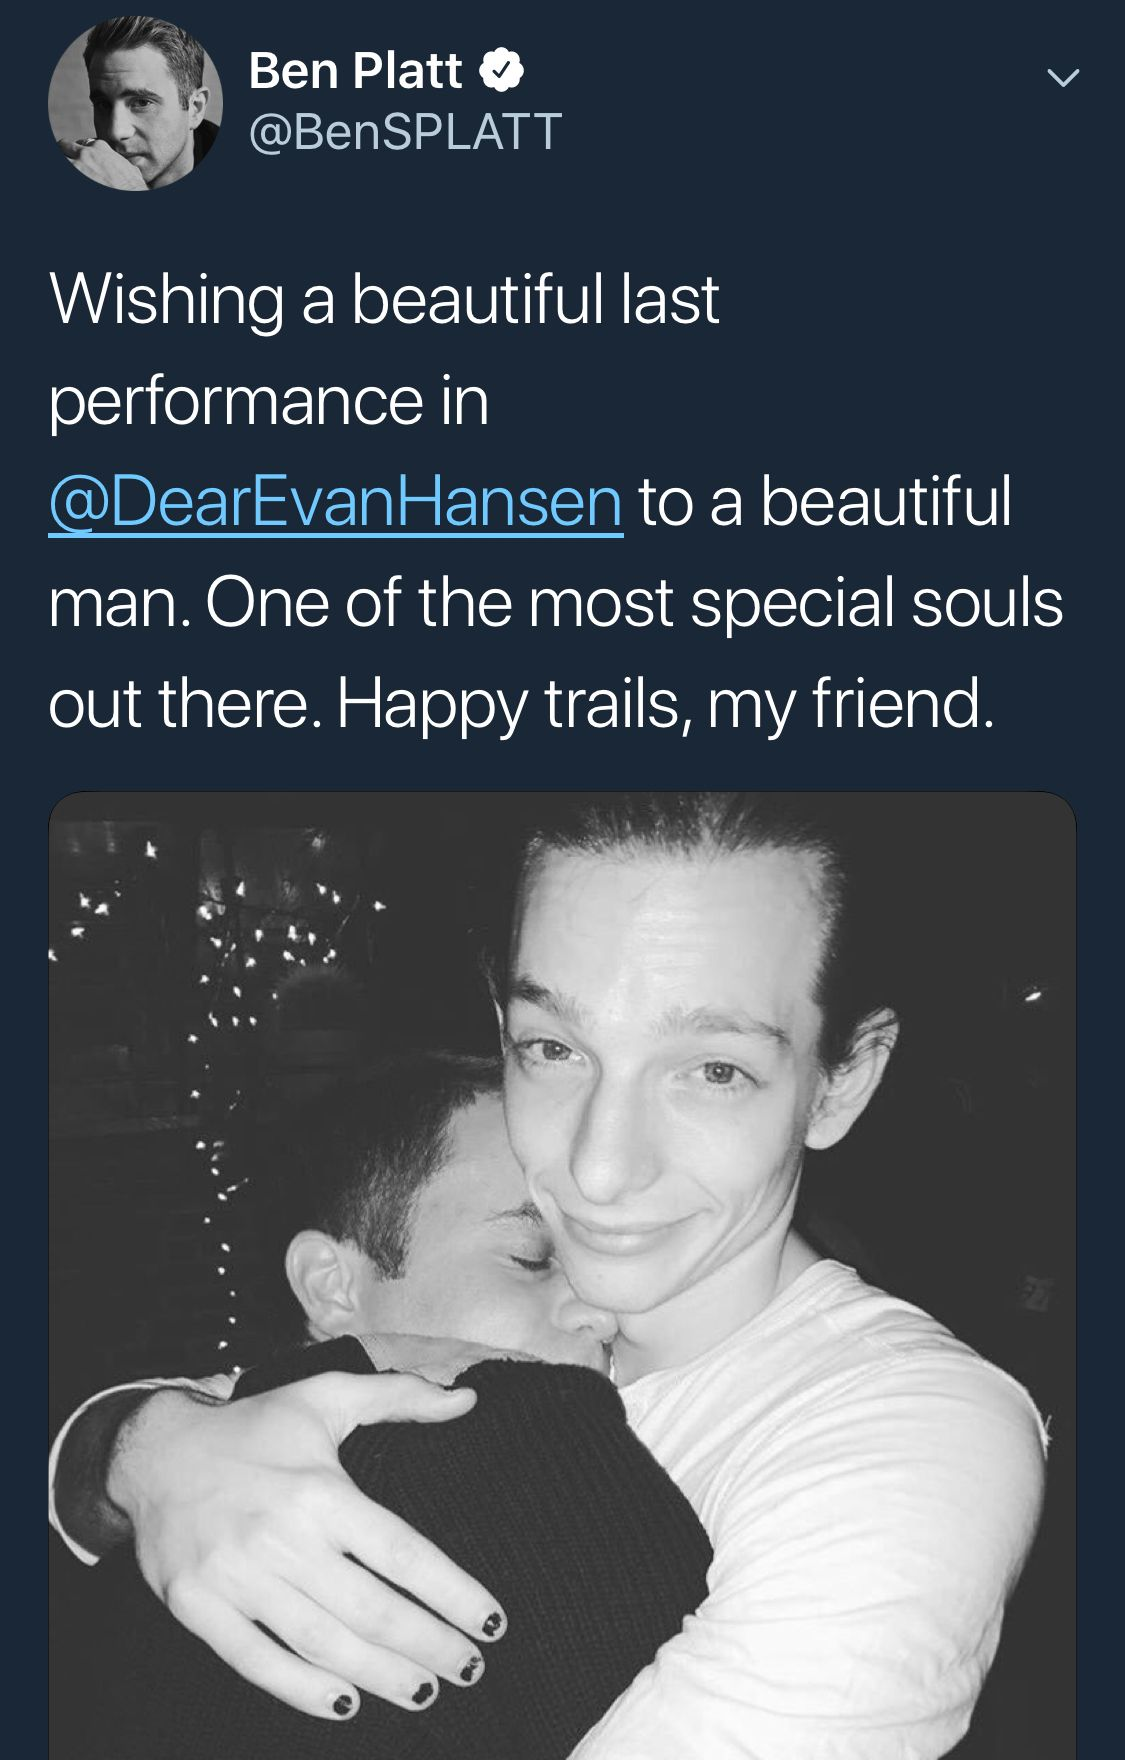 Ben Platt On Twitter Making Me Cry Dear Evan Hansen Dear Even Hansen Evan Hansen